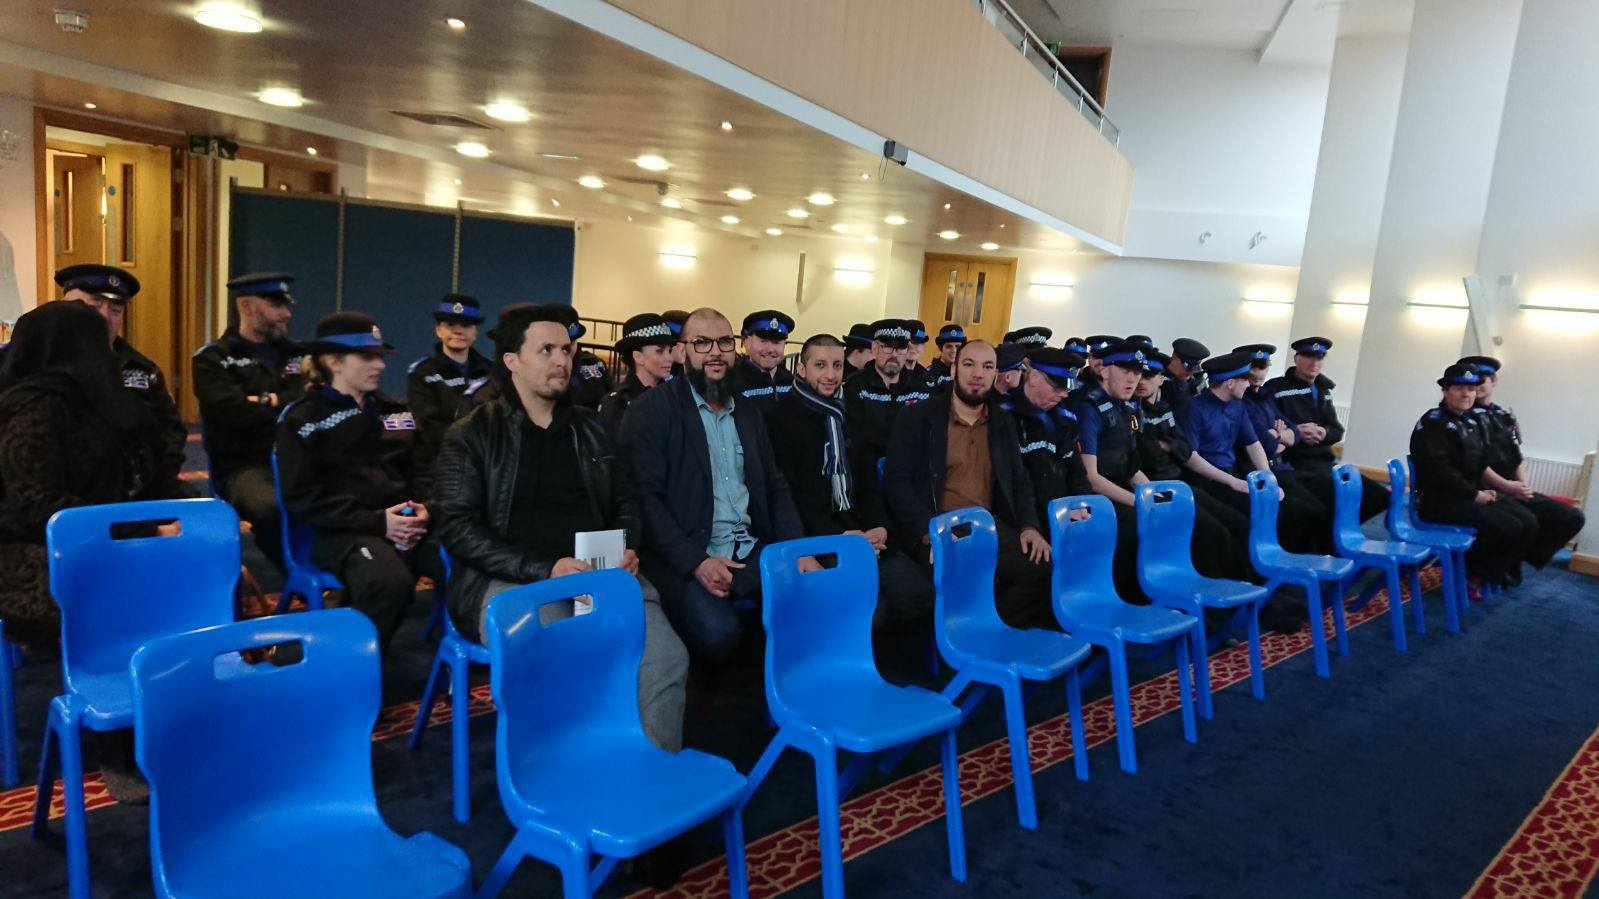 La police a la mosquée de Reading 3